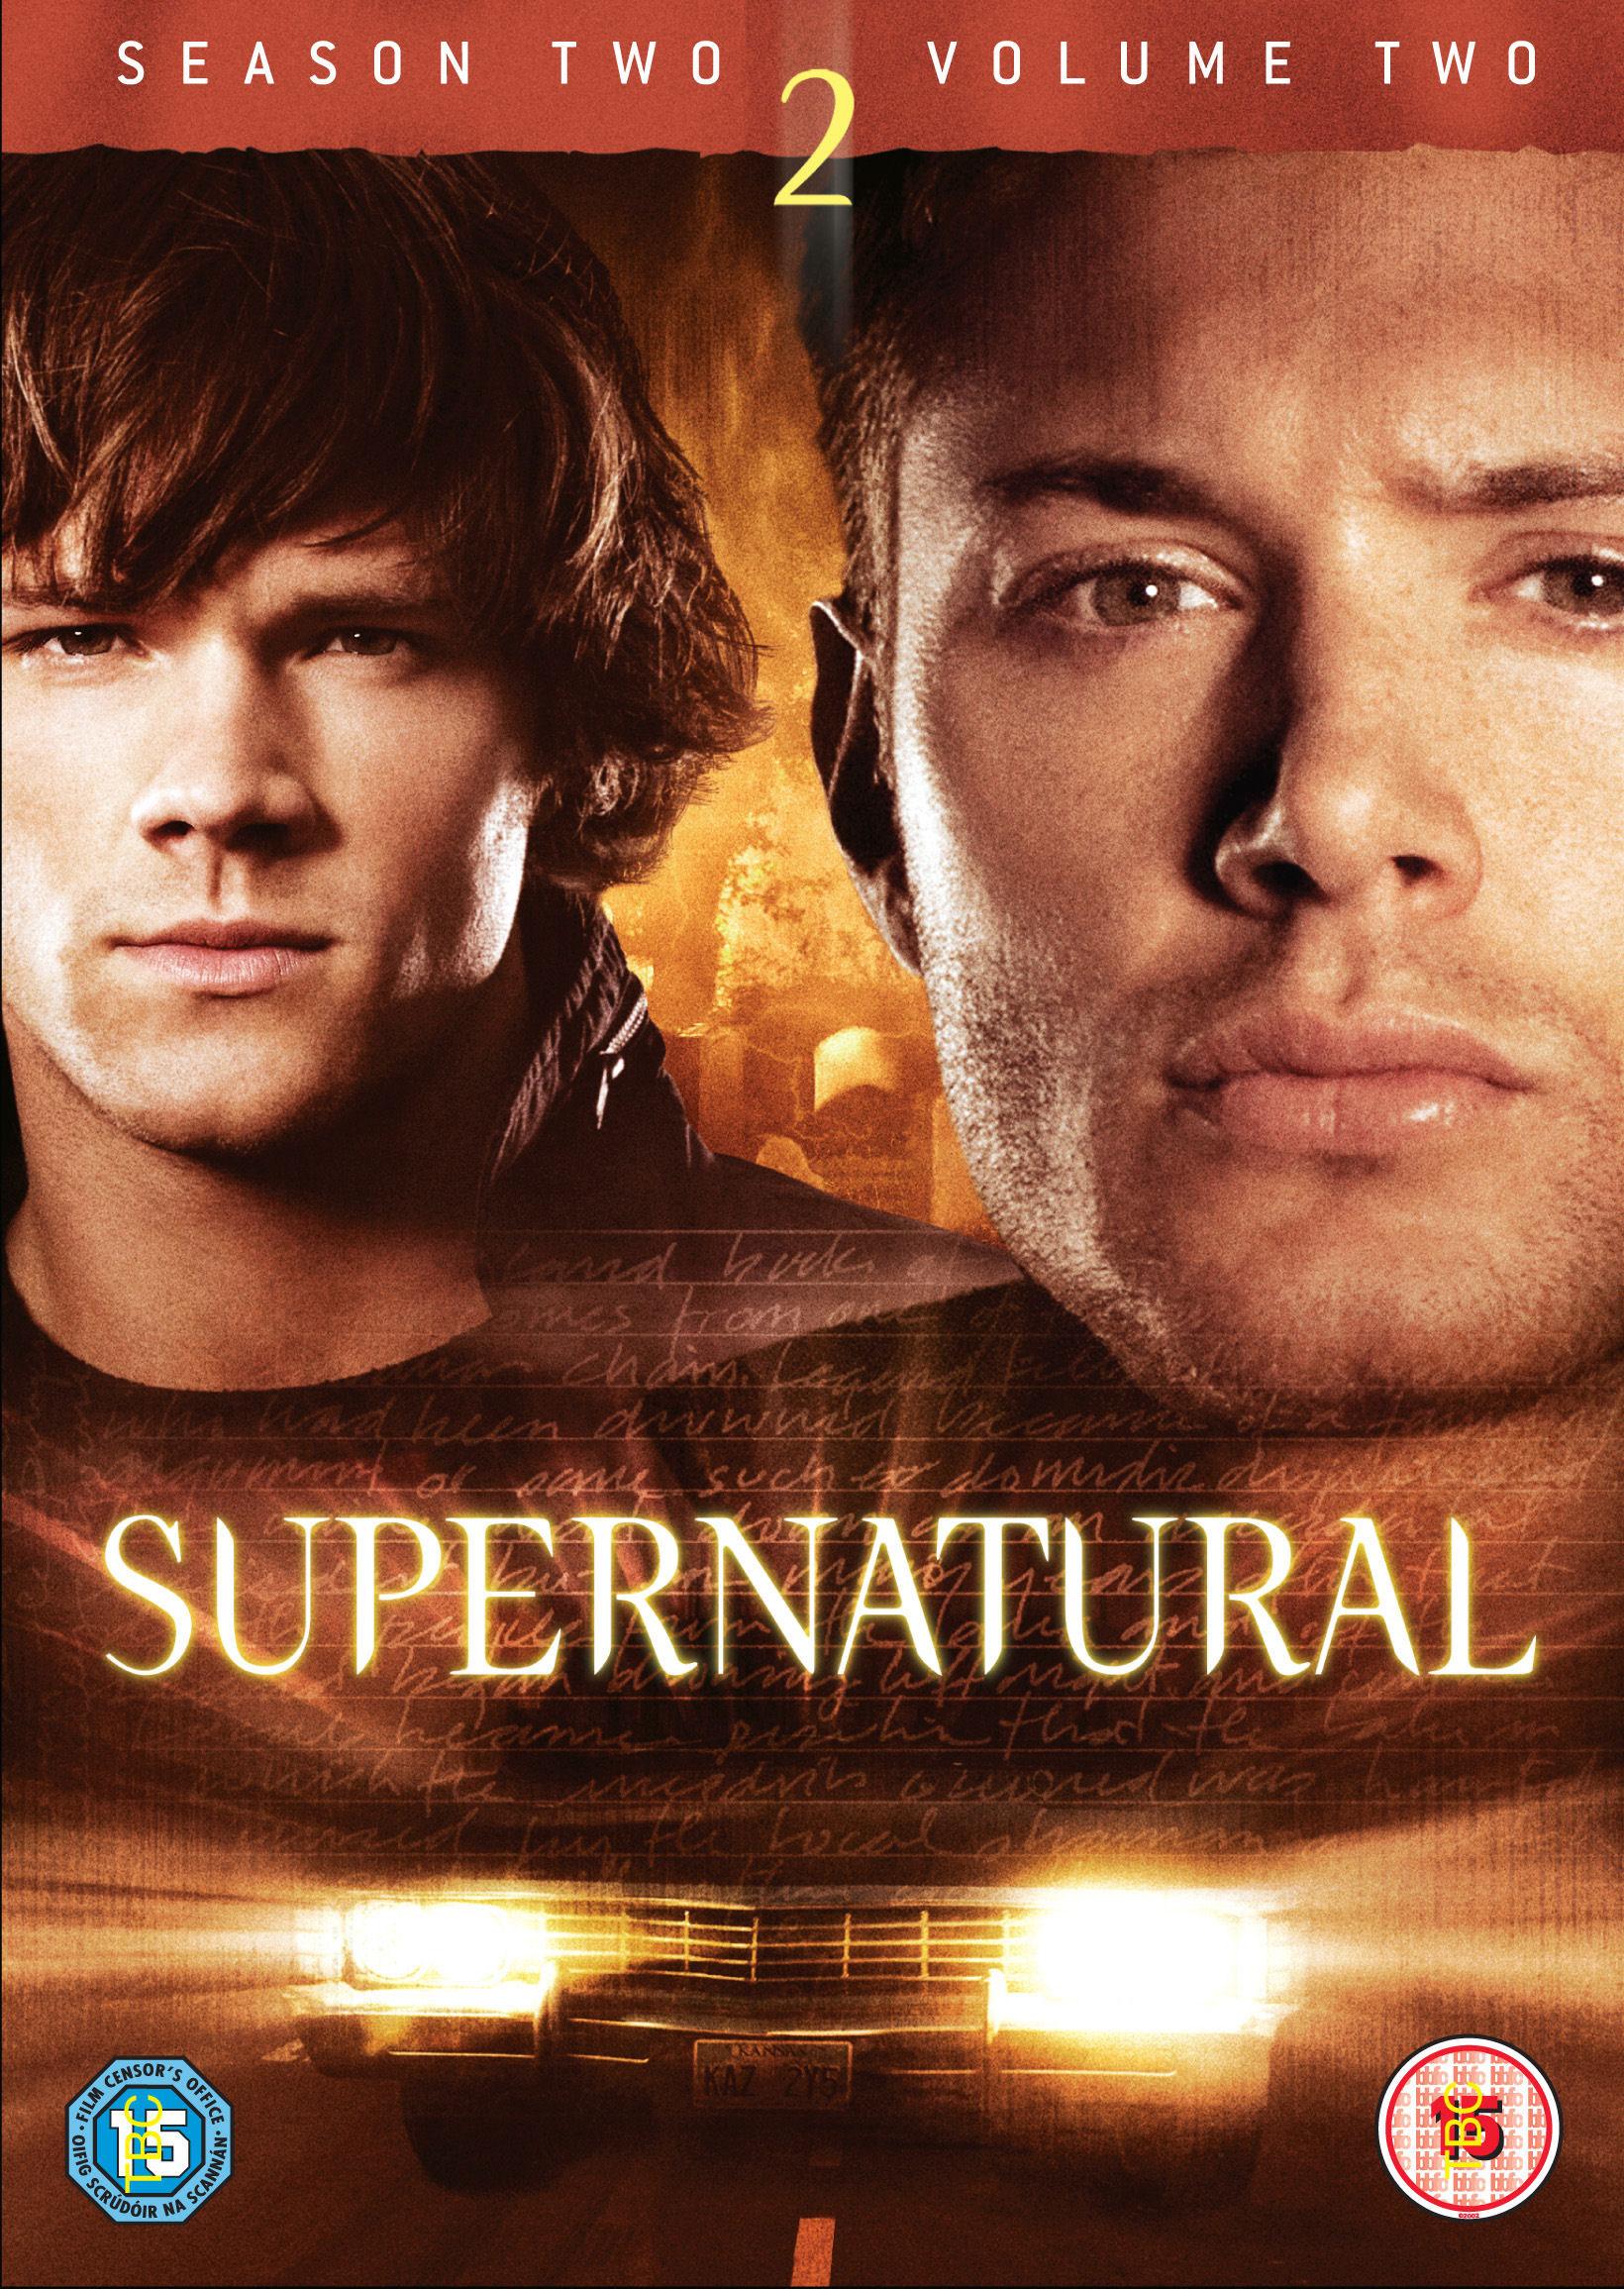 Supernatural Season 2 ล่าปริศนาเหนือโลก ปี 2 ( EP. 1-22 END ) [พากย์ไทย]